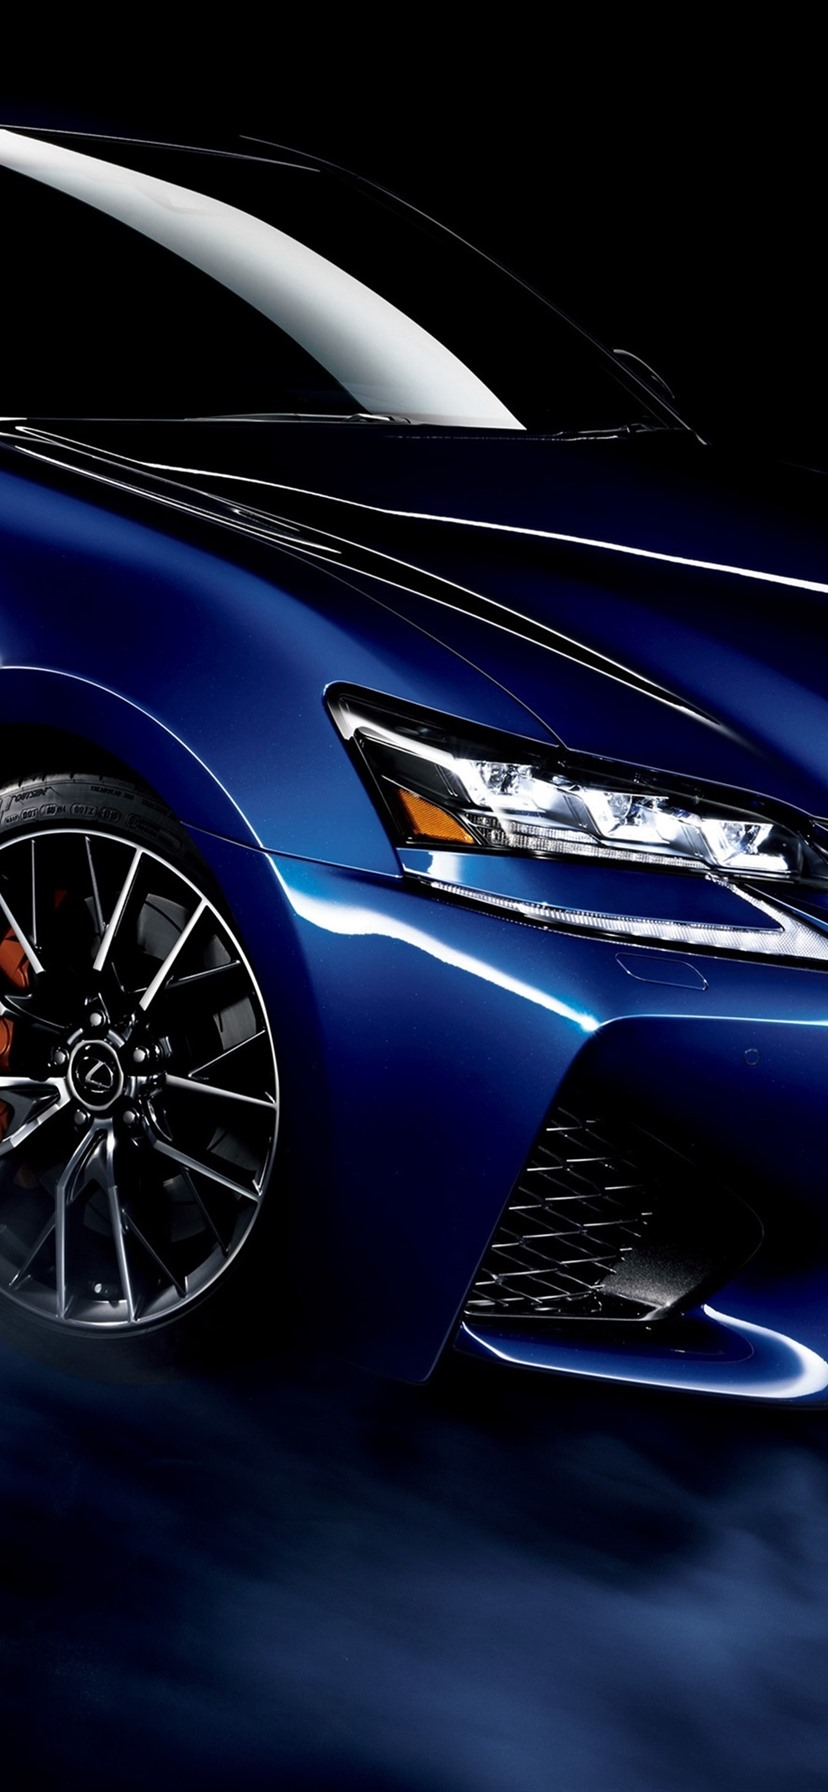 Wallpaper Lexus Gs F Blue Car Smoke Black Background 3840x2160 Uhd